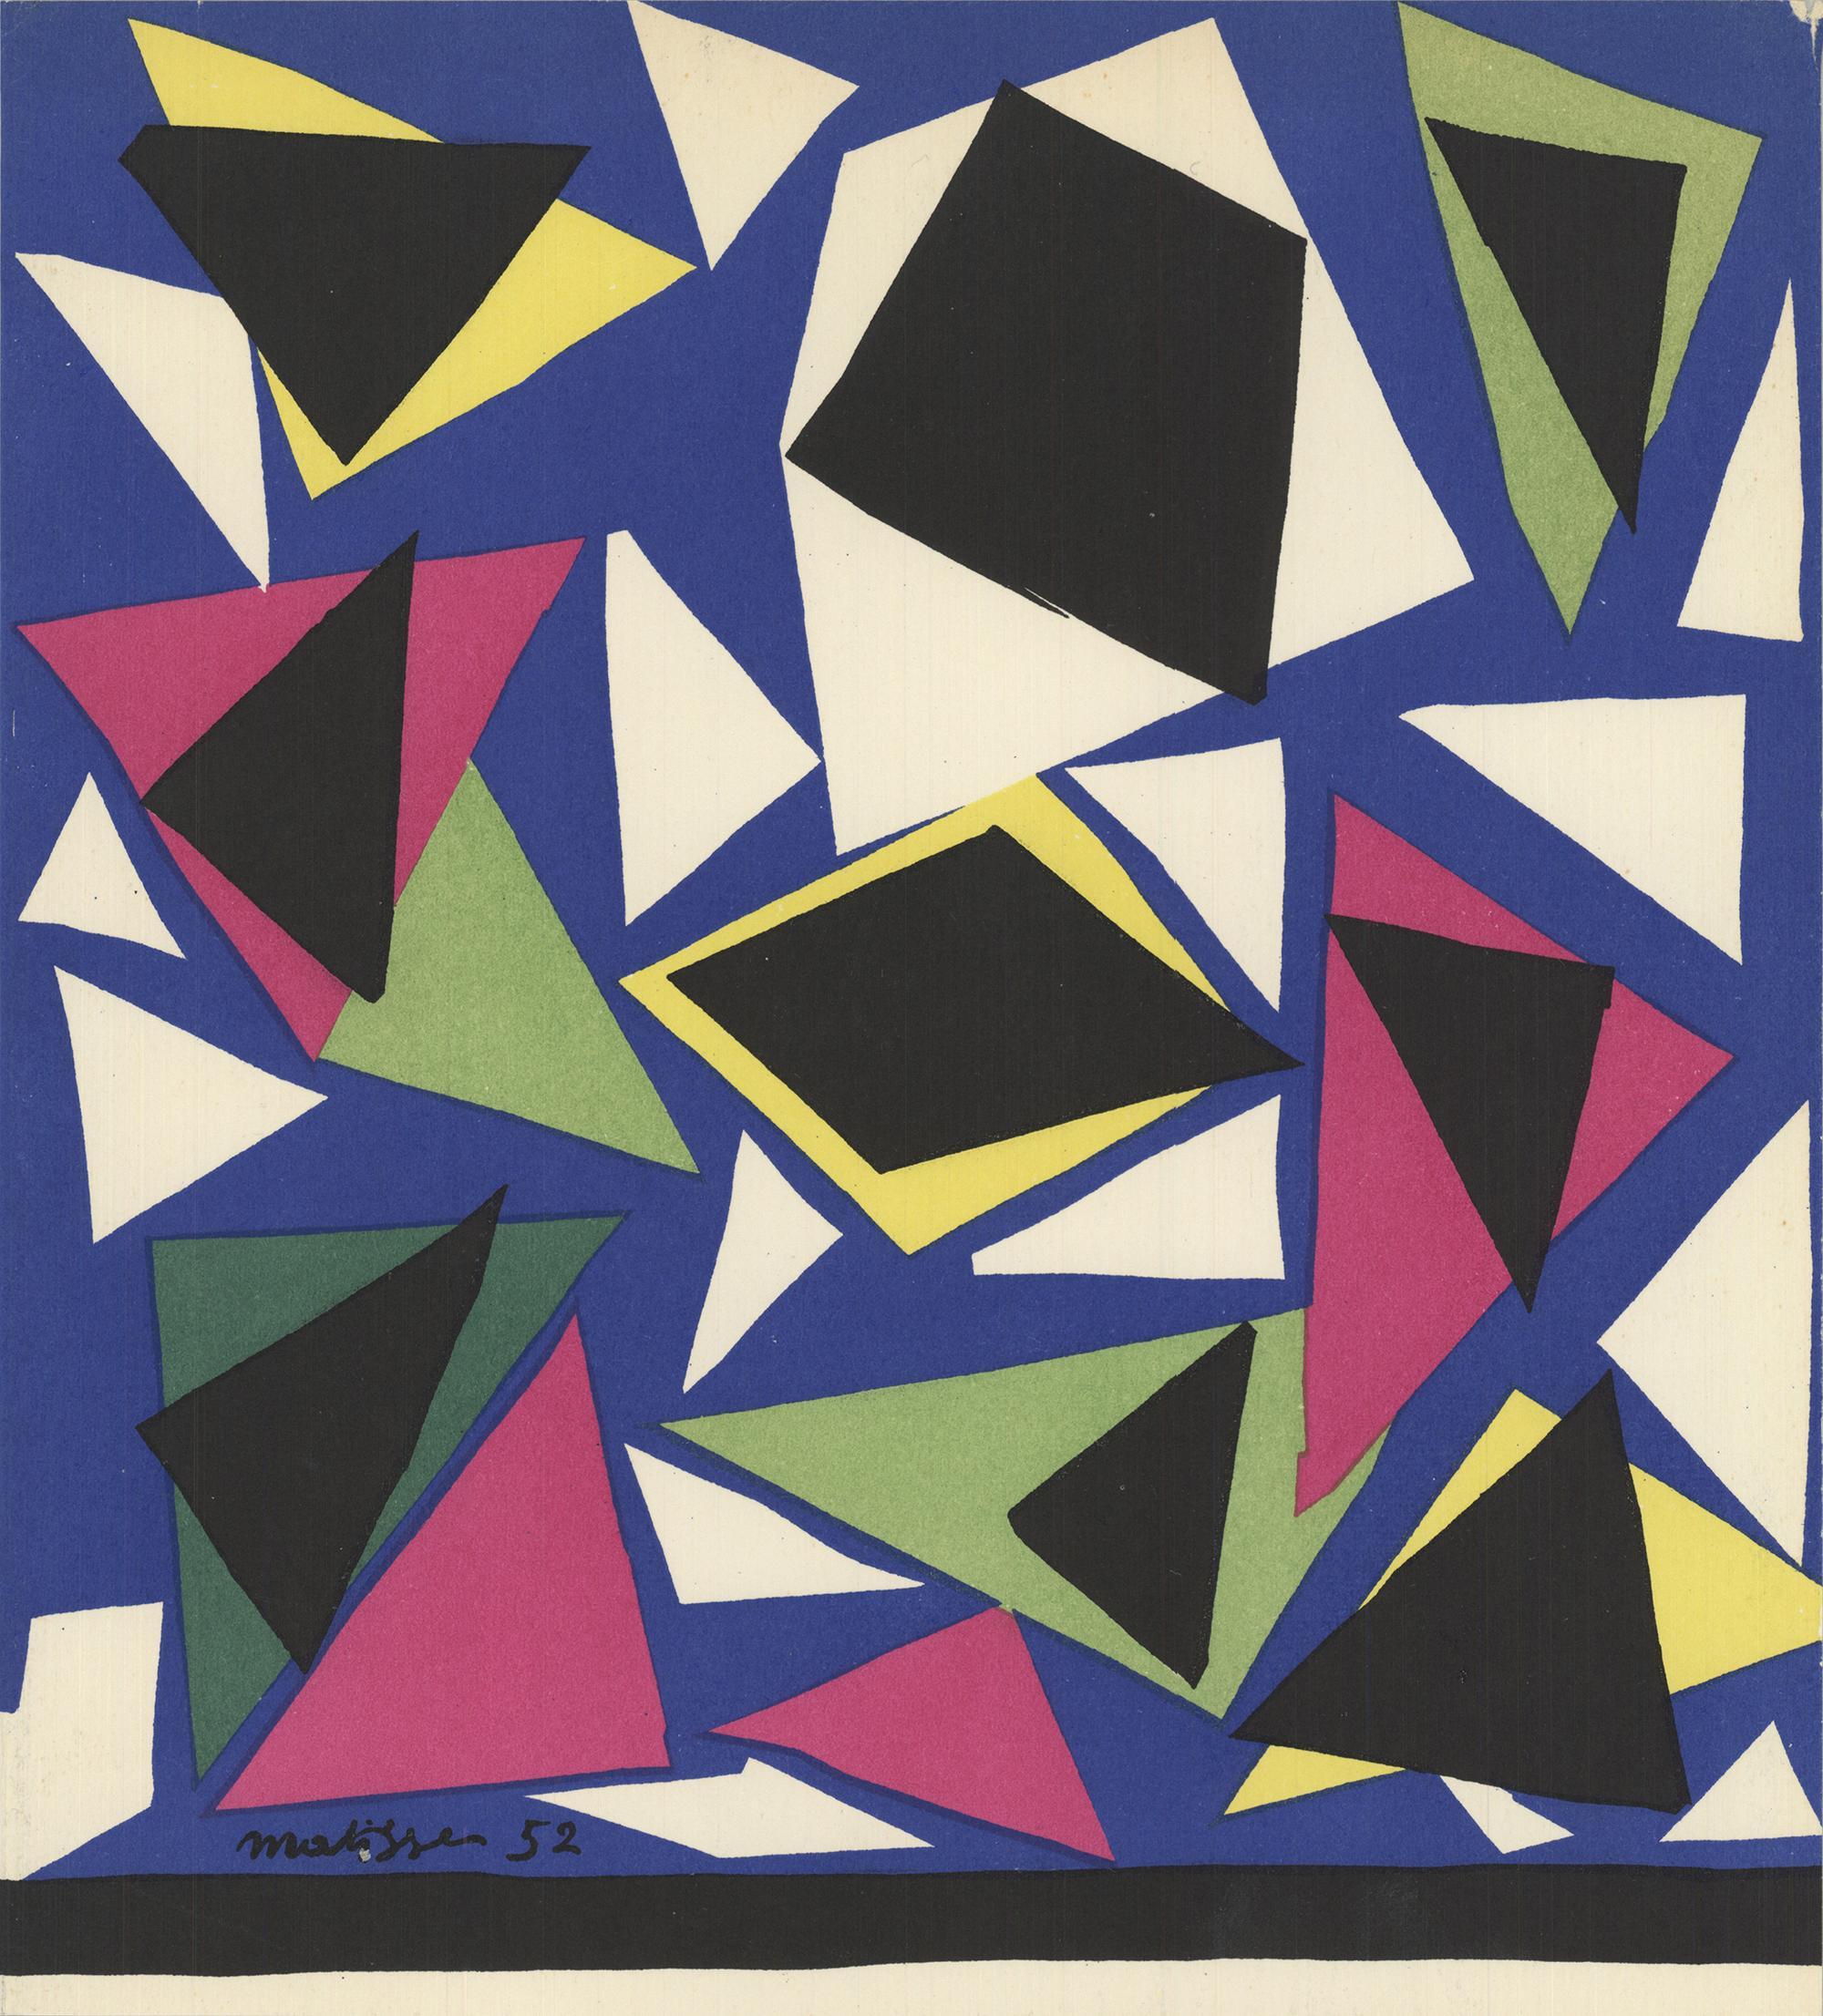 1952 Henri Matisse 'L'Escargot' Lithograph